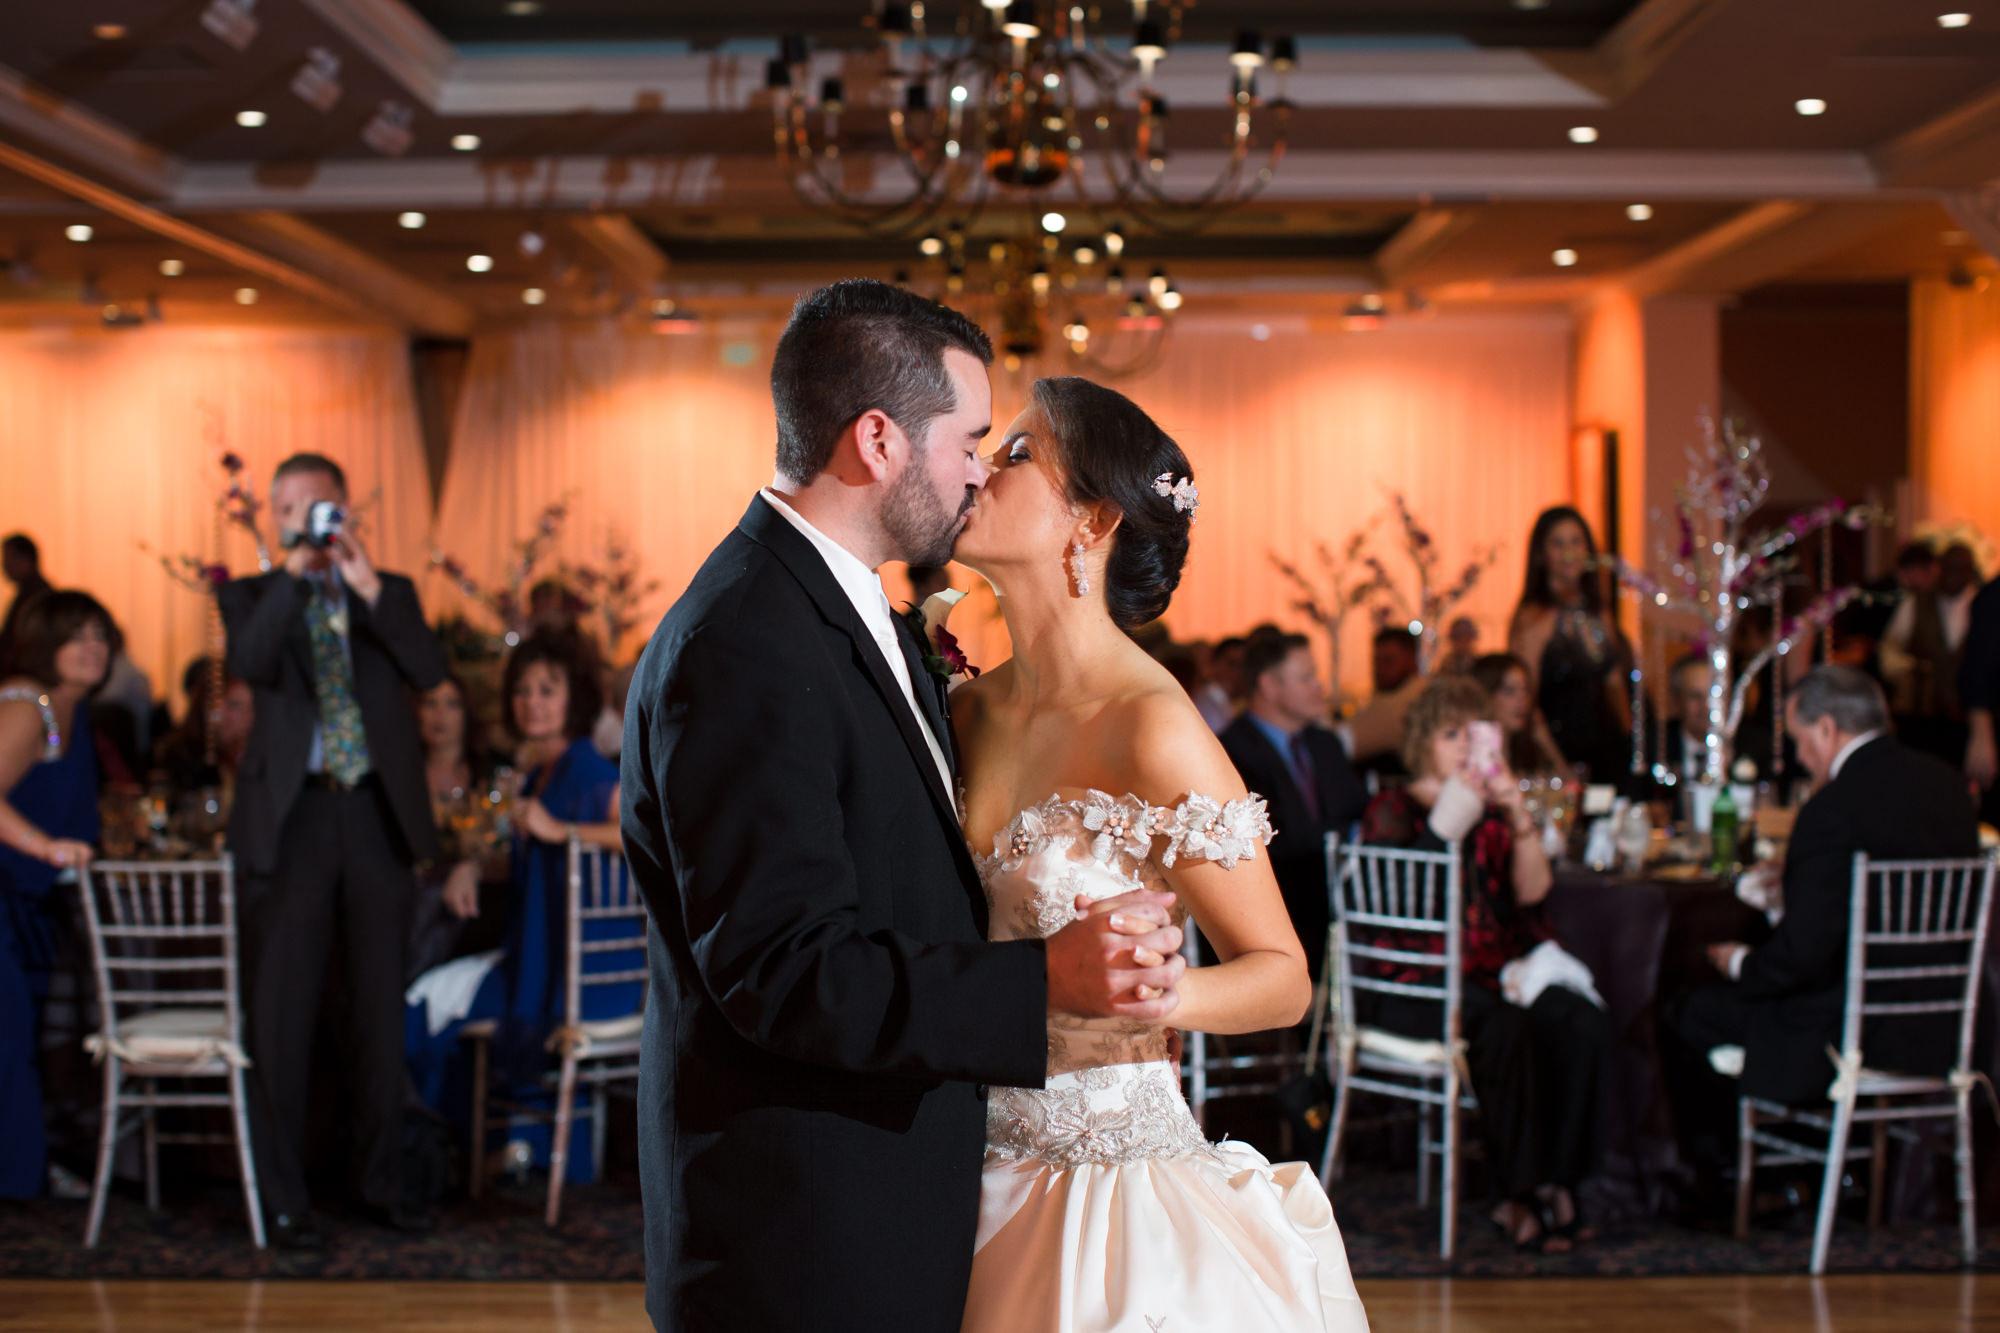 Benvenuto_Wedding_catholic_Florida_Bride-Groom-120.jpg